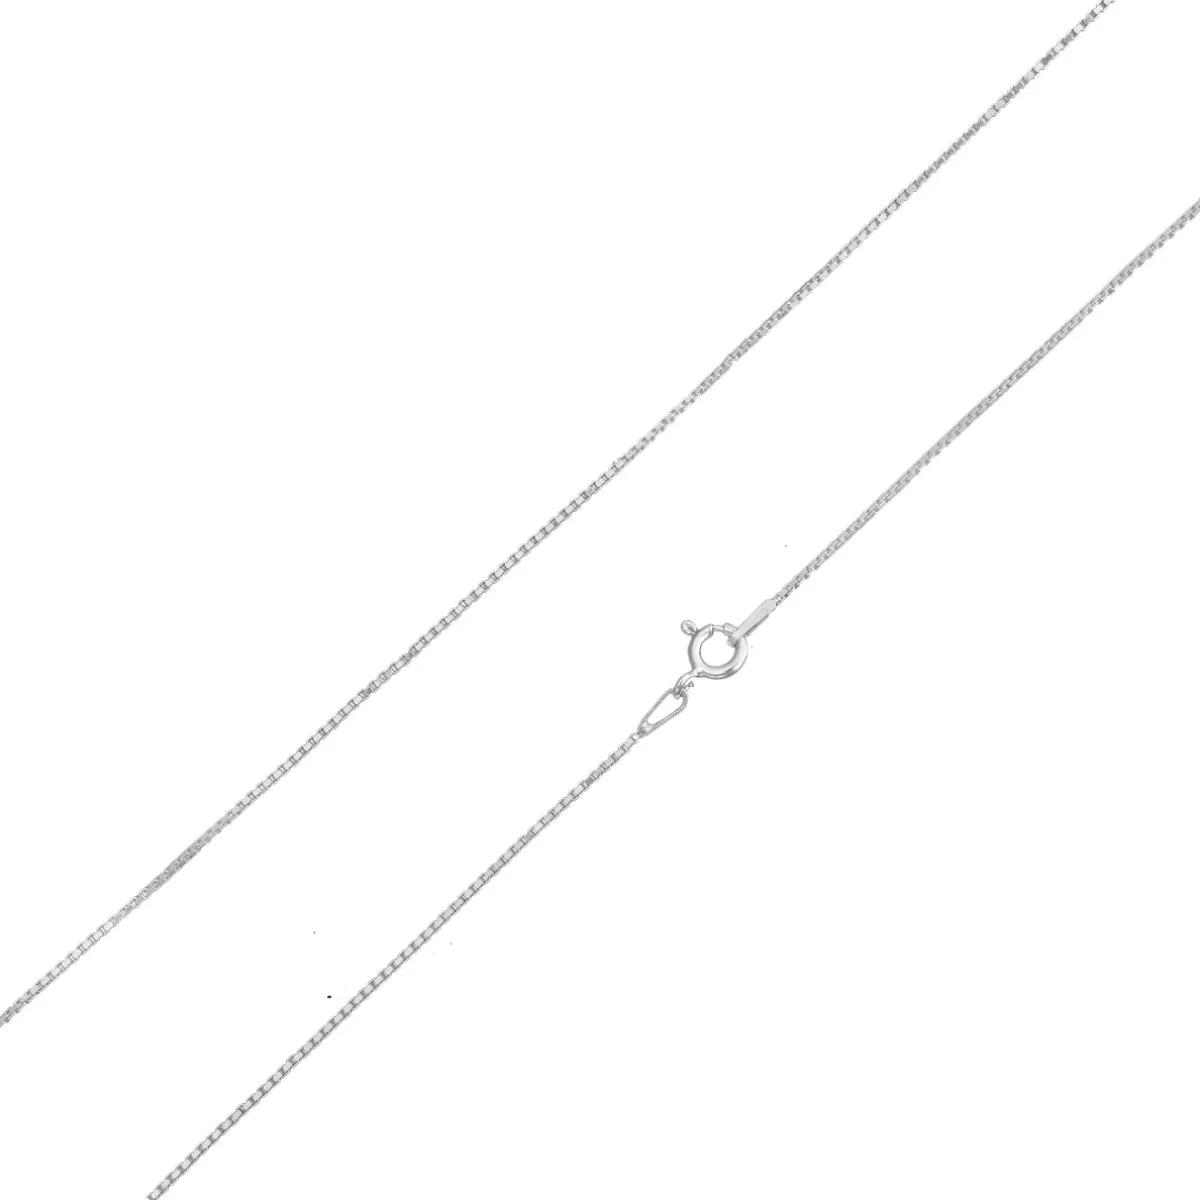 Cordão Corrente Masculina Veneziana 80cm Pingente Cruz Crucifixo Prata 925